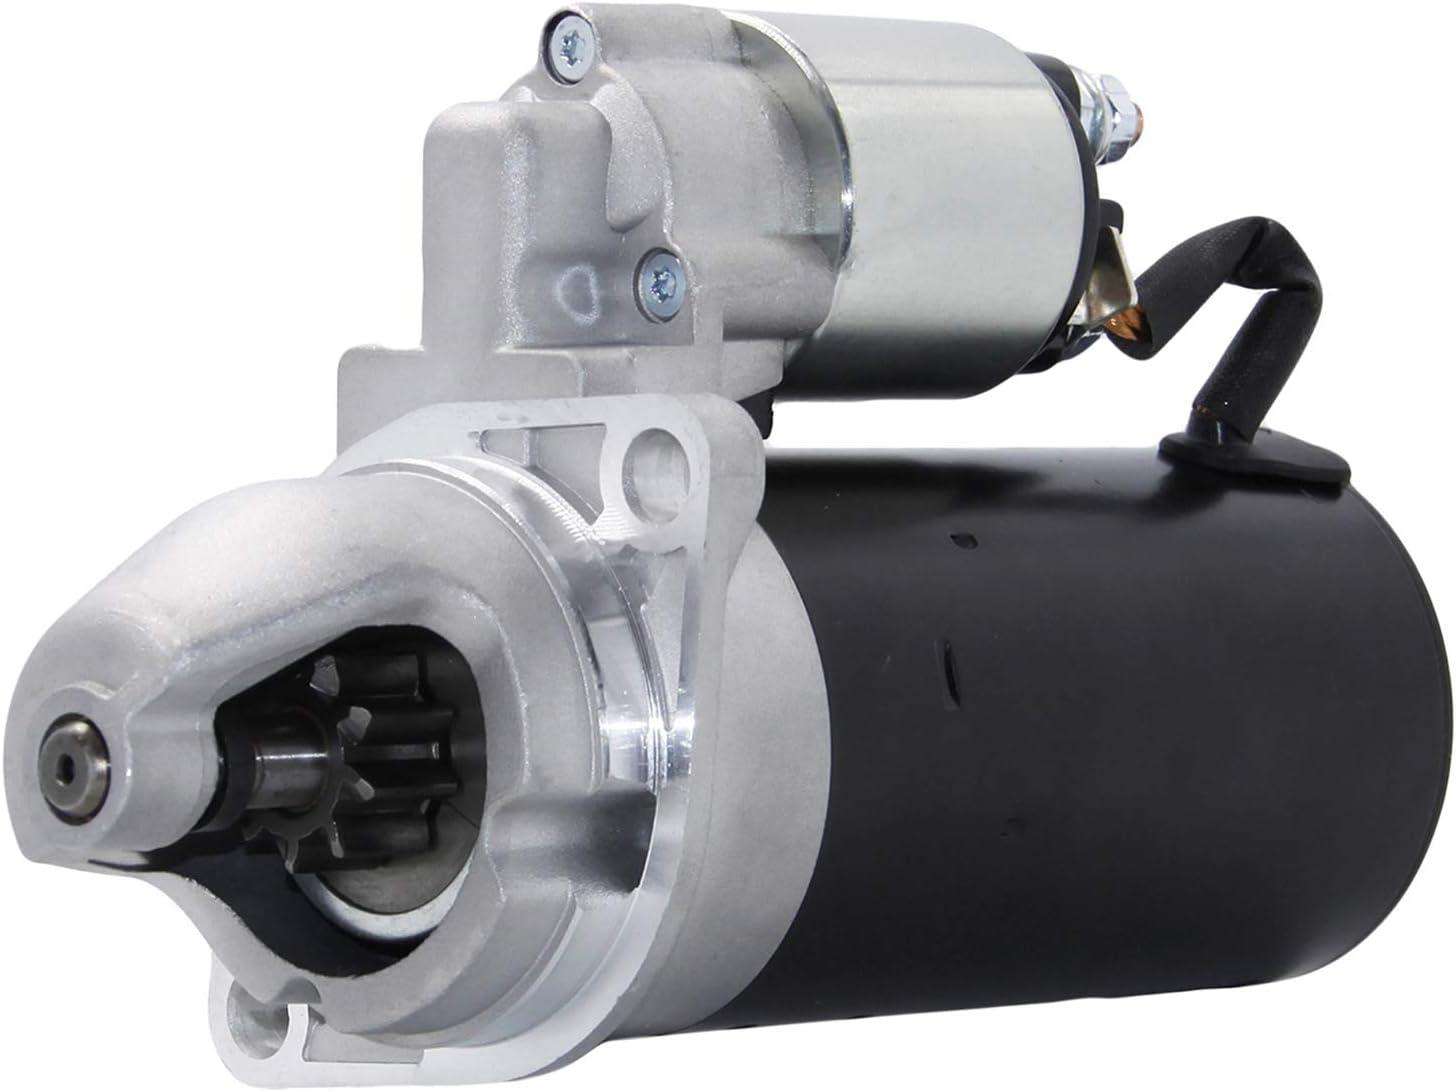 New Manufacturer regenerated product Brand Cheap Sale Venue Starter Motor For JOHN FGL5840089 223 18369 DEERE 0001109029